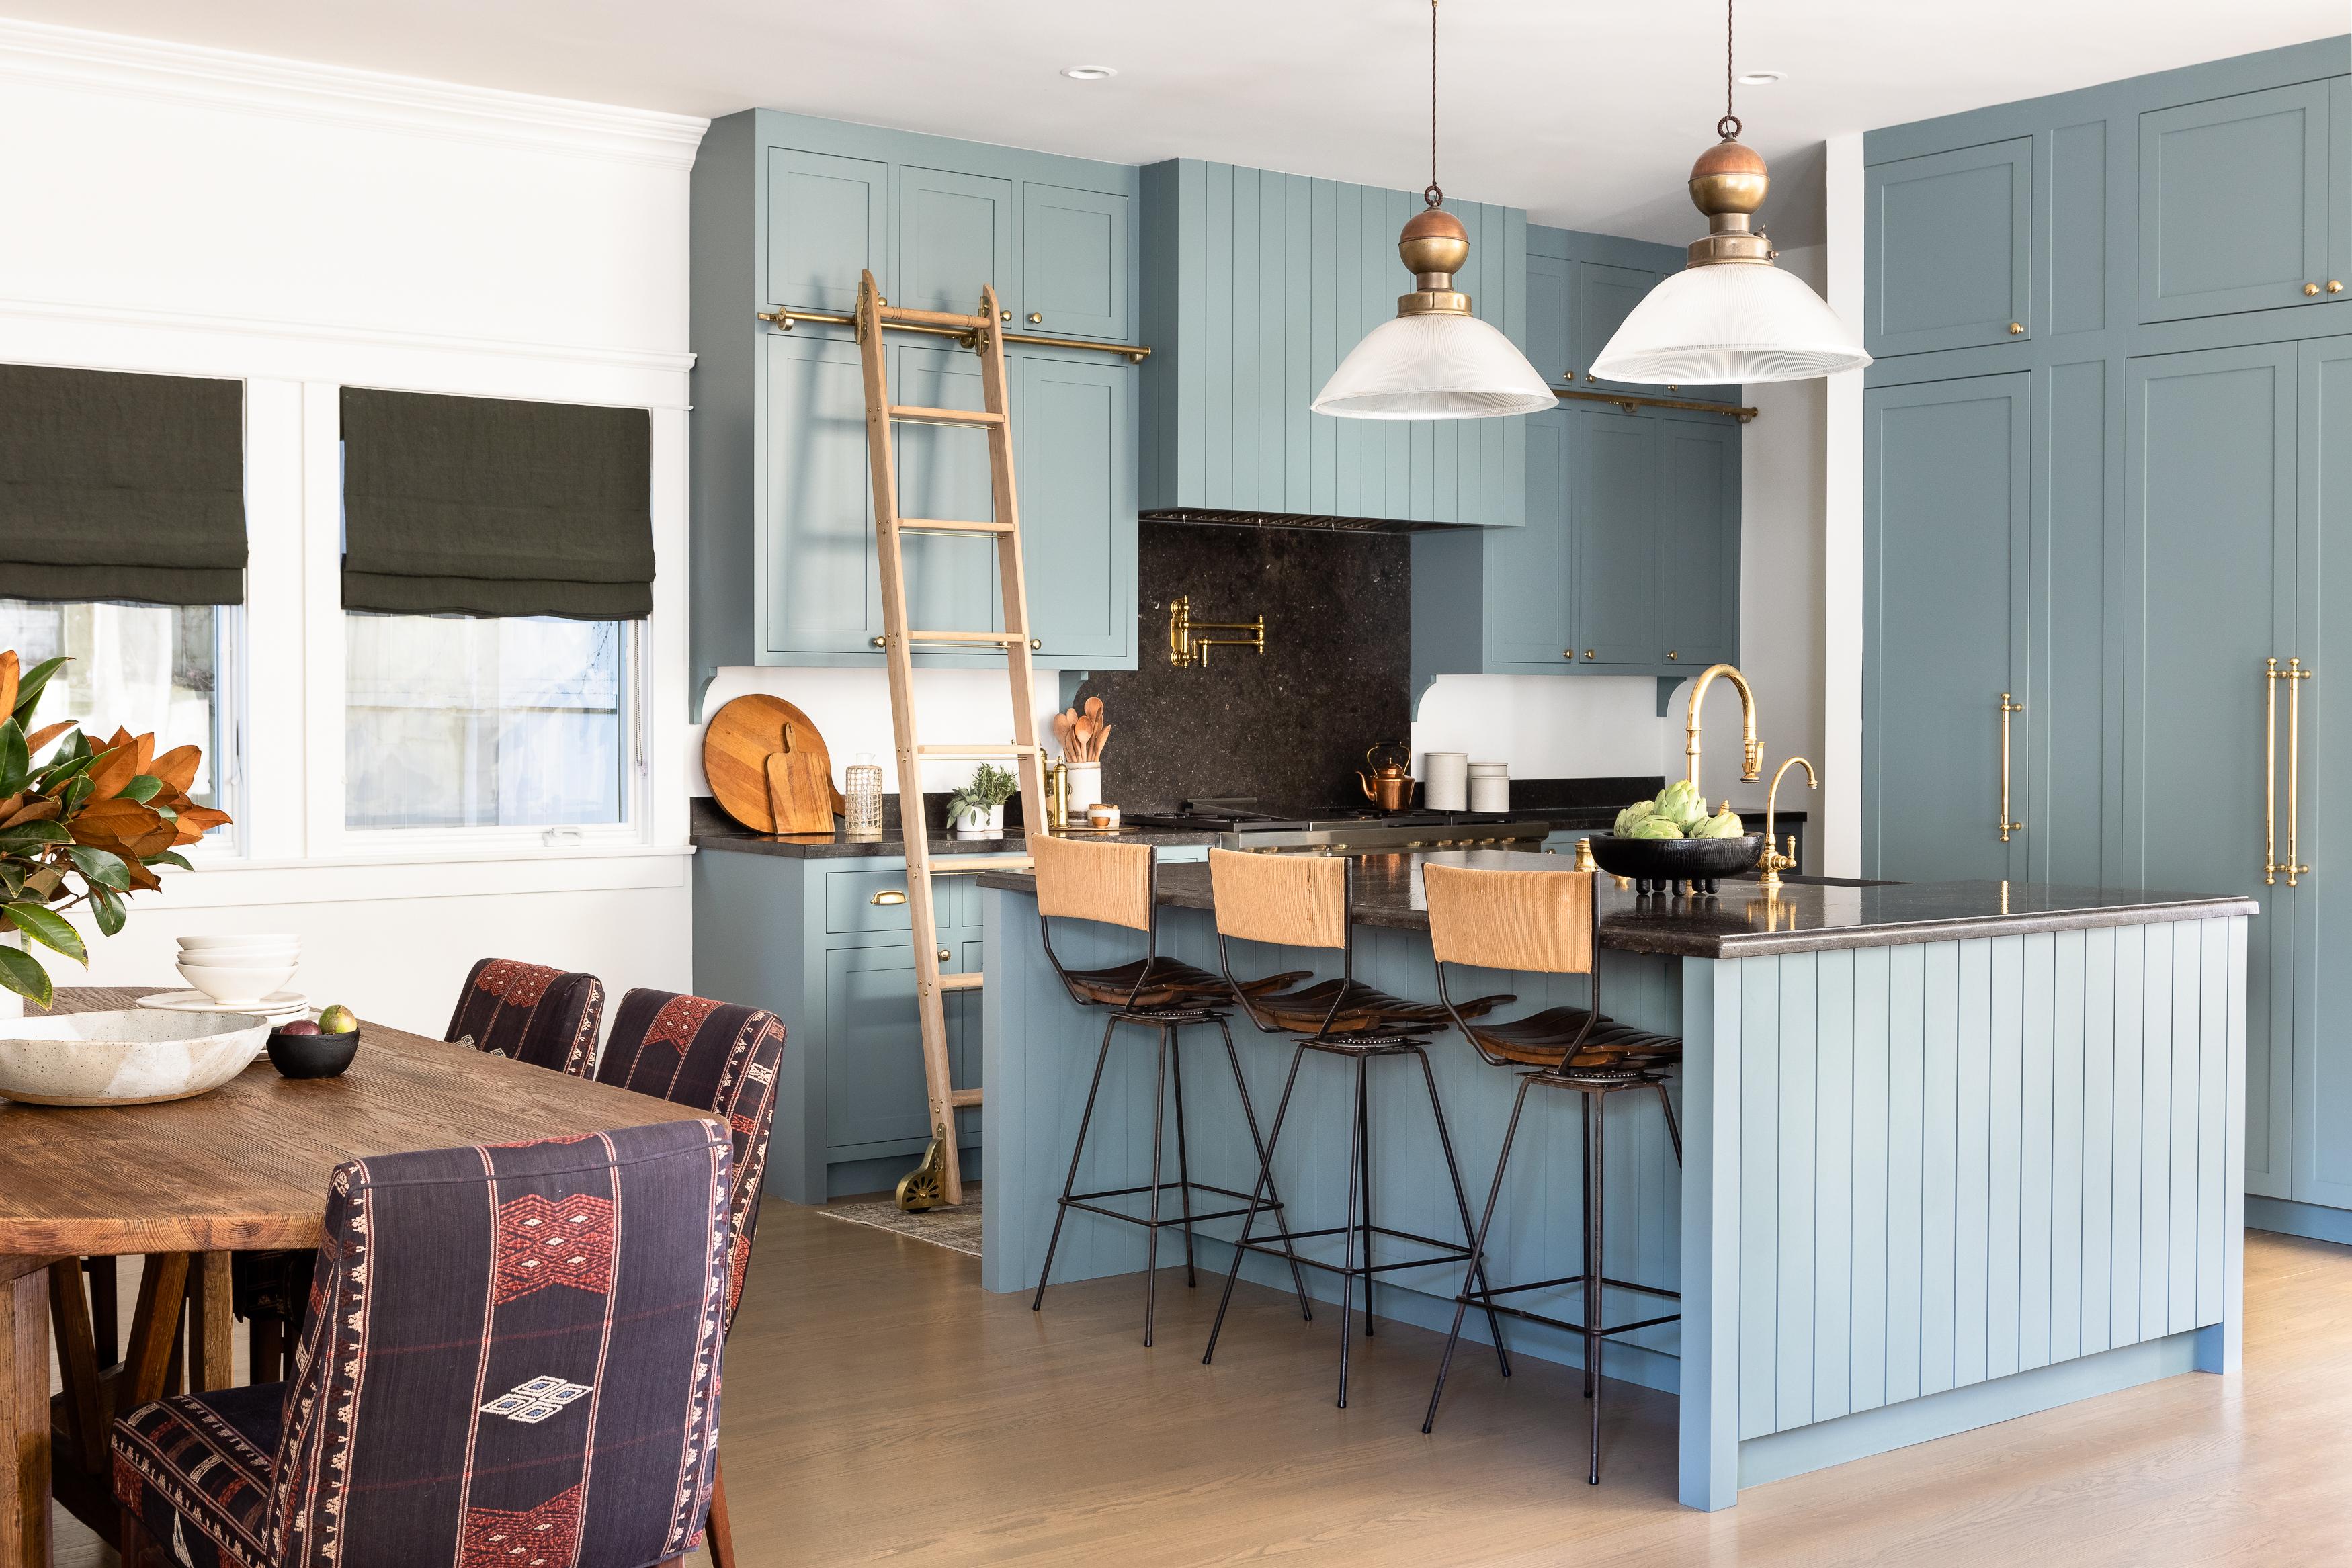 Amber Interiors - Client No Show Bungalow